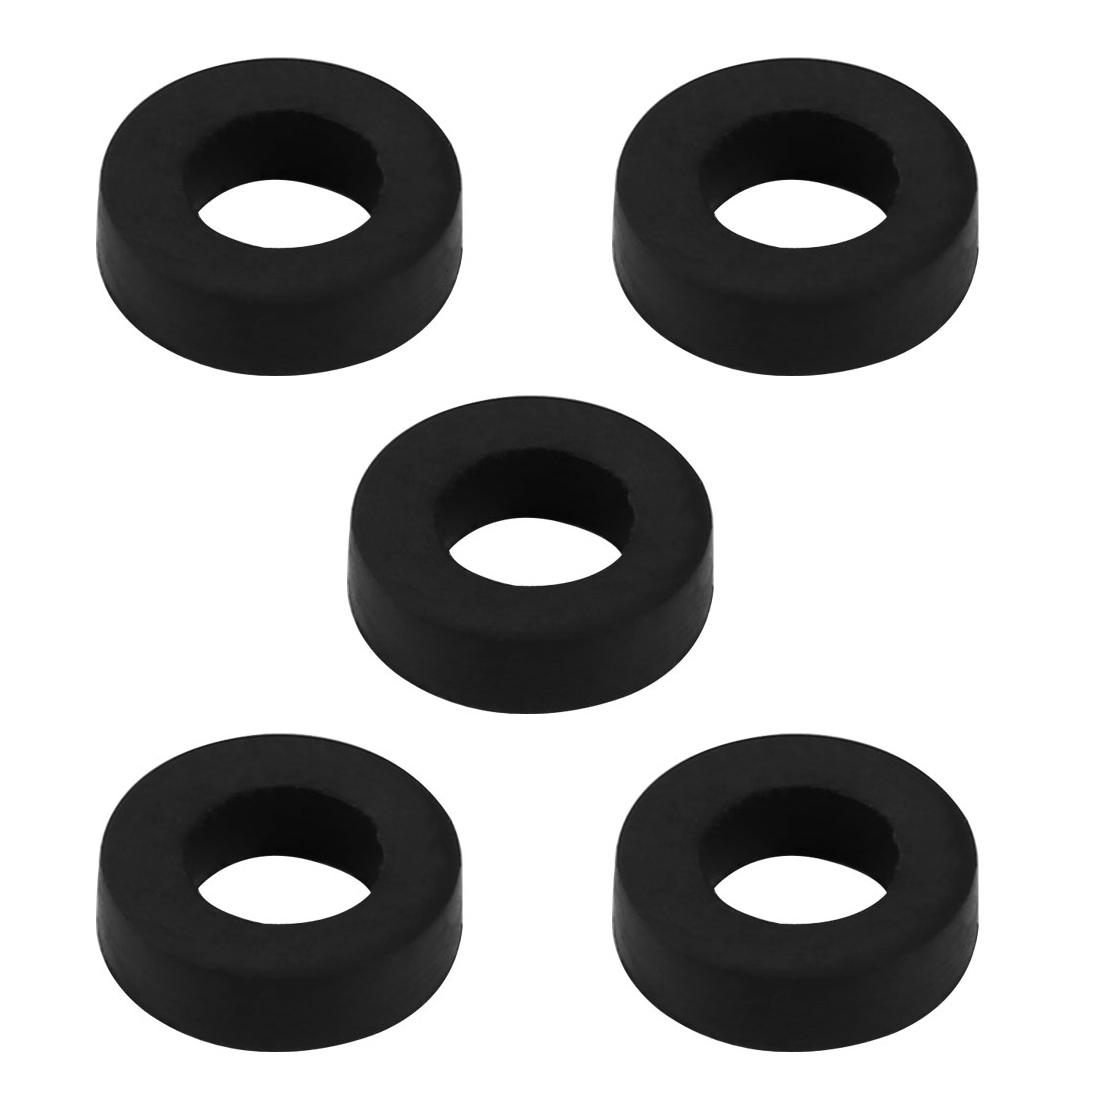 5pcs Black Rubber Round Flat Washer Assortment Size 6x11x3mm Flat Washer